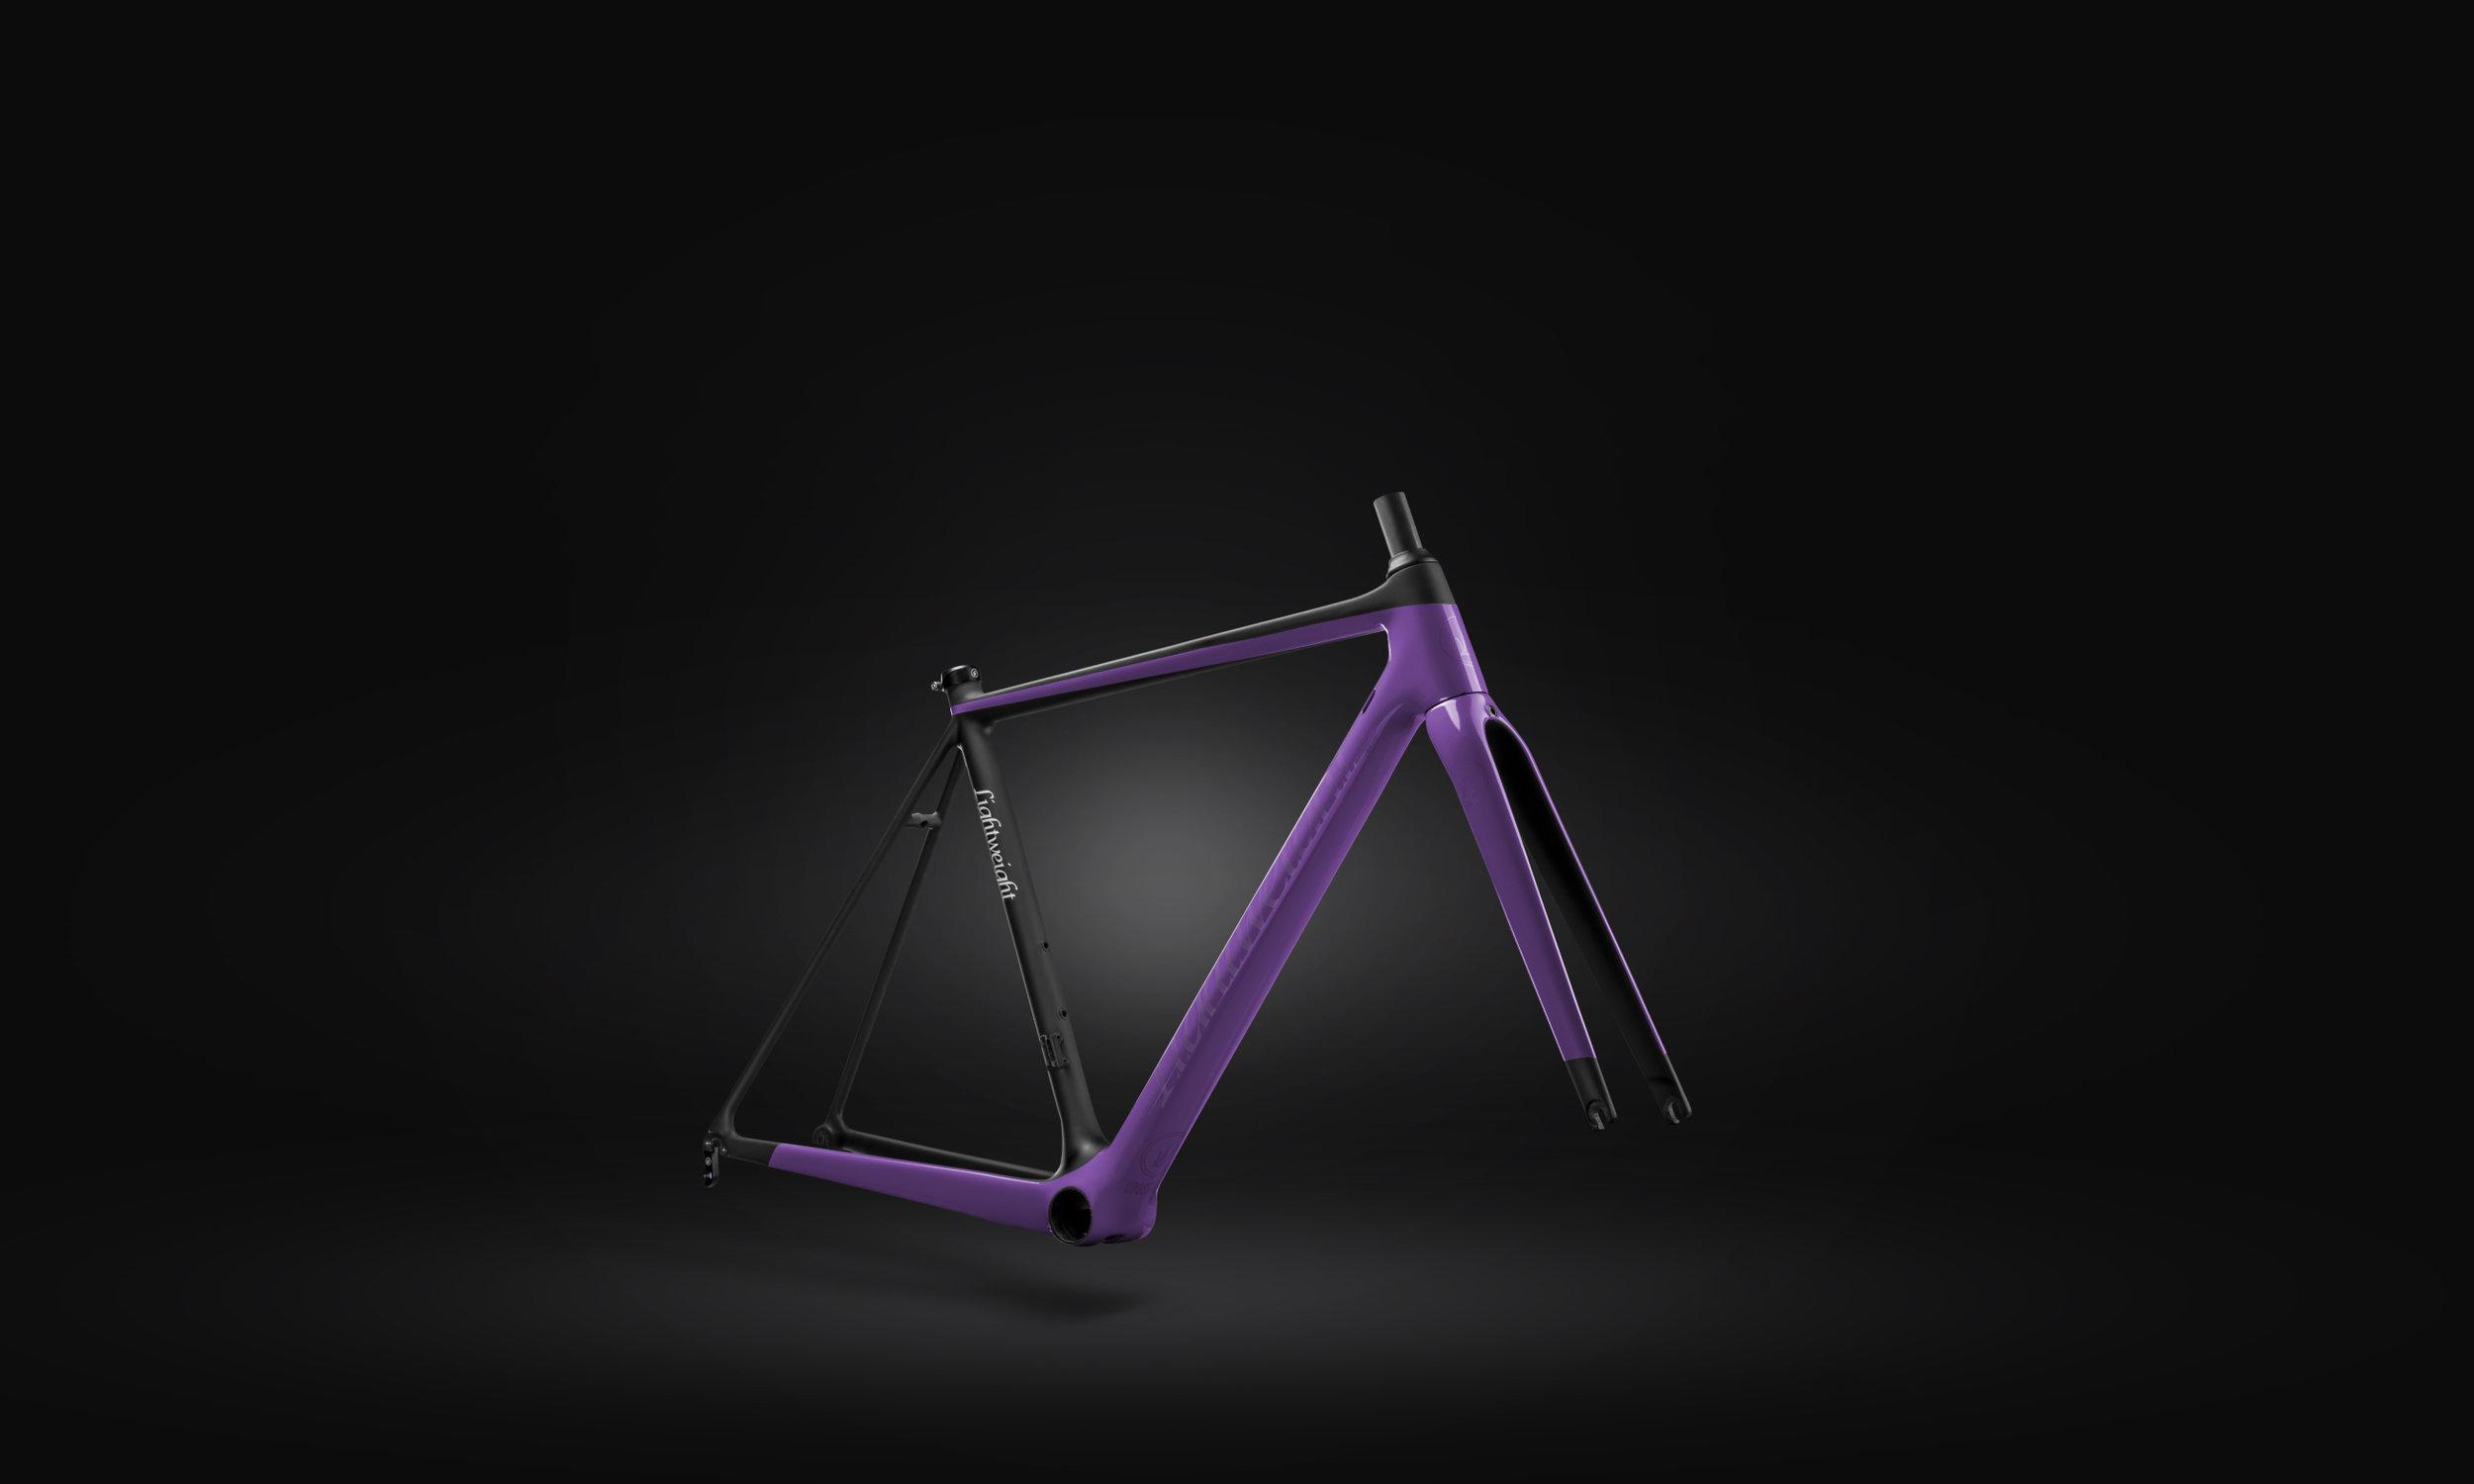 urgestalt_2019_purple_with_black_backround_04.jpg